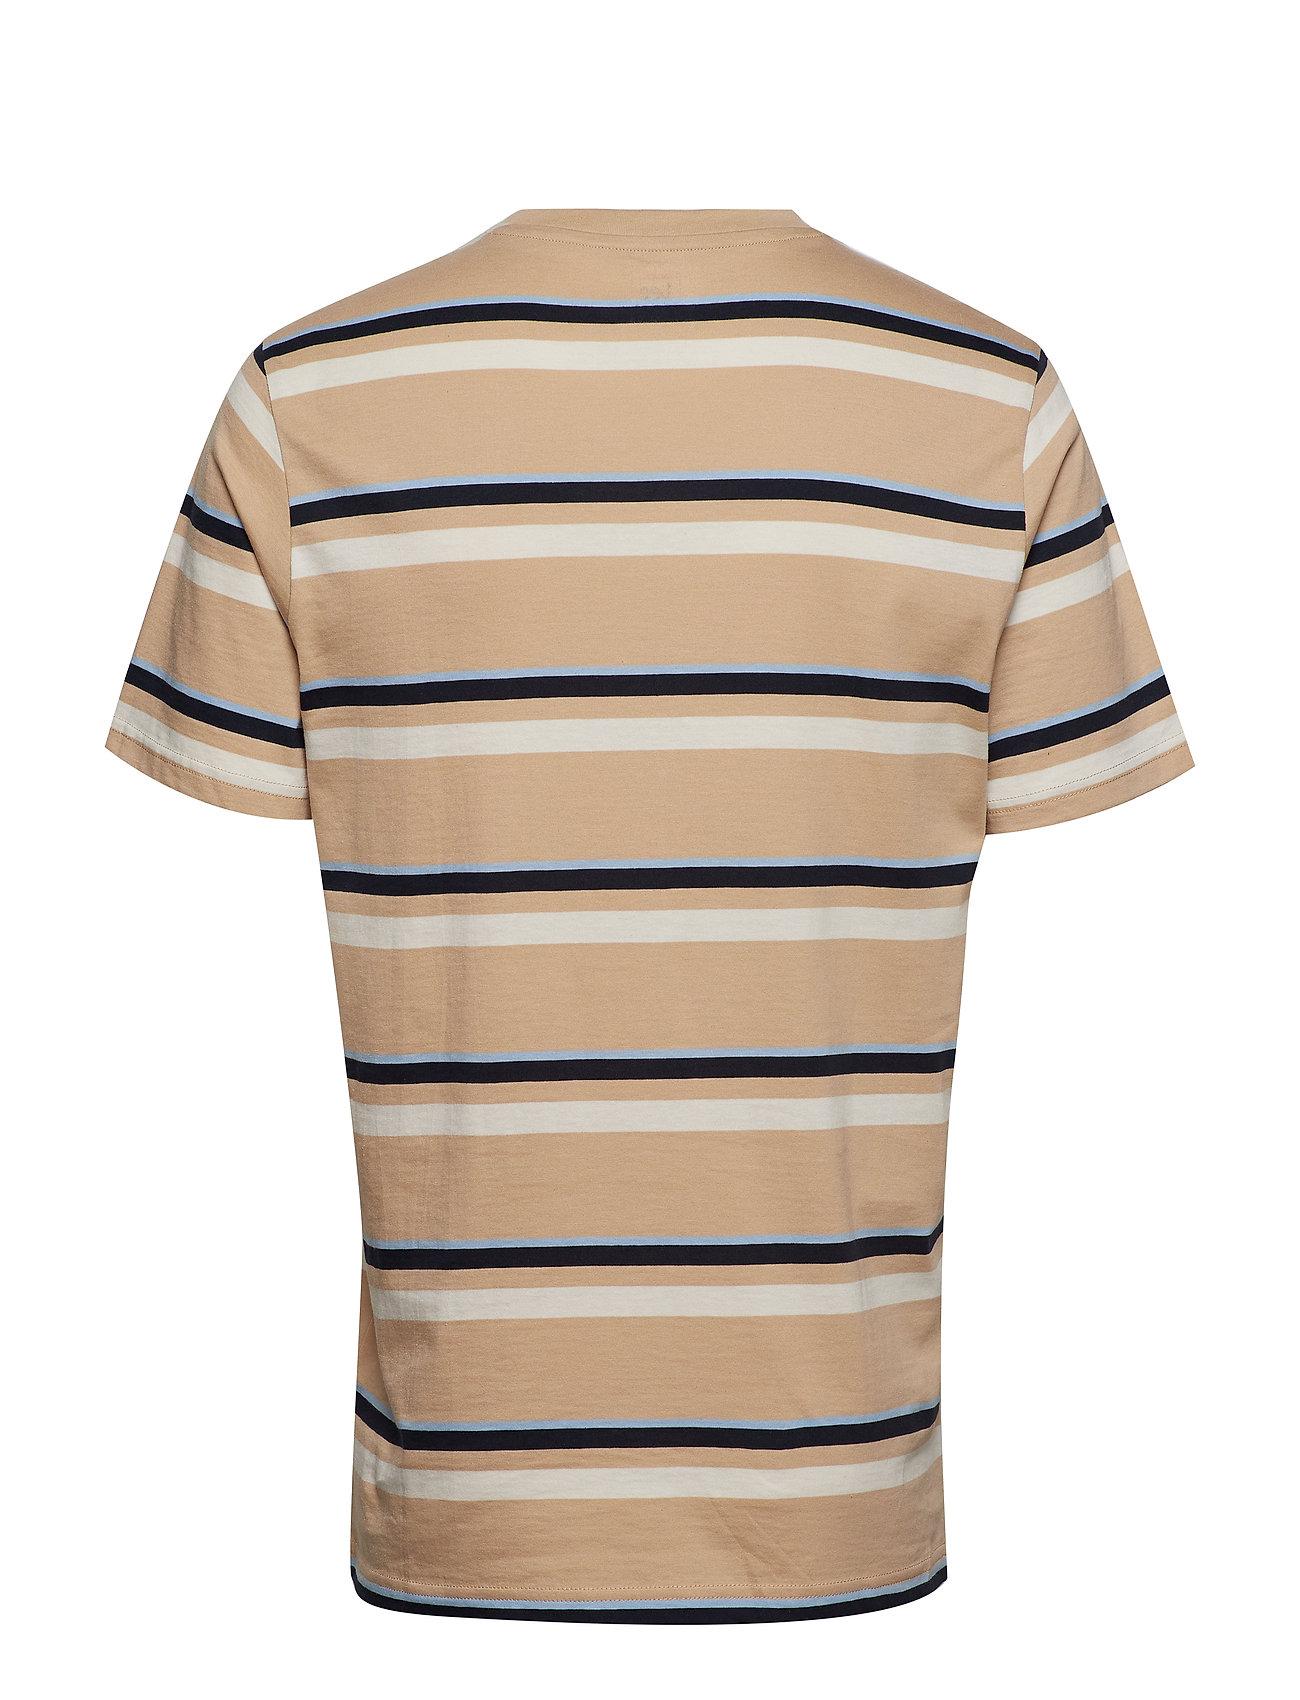 Stripesdust BeigeLee BeigeLee Jeans Jeans Stripesdust BeigeLee Jeans Stripesdust 5L4jAR